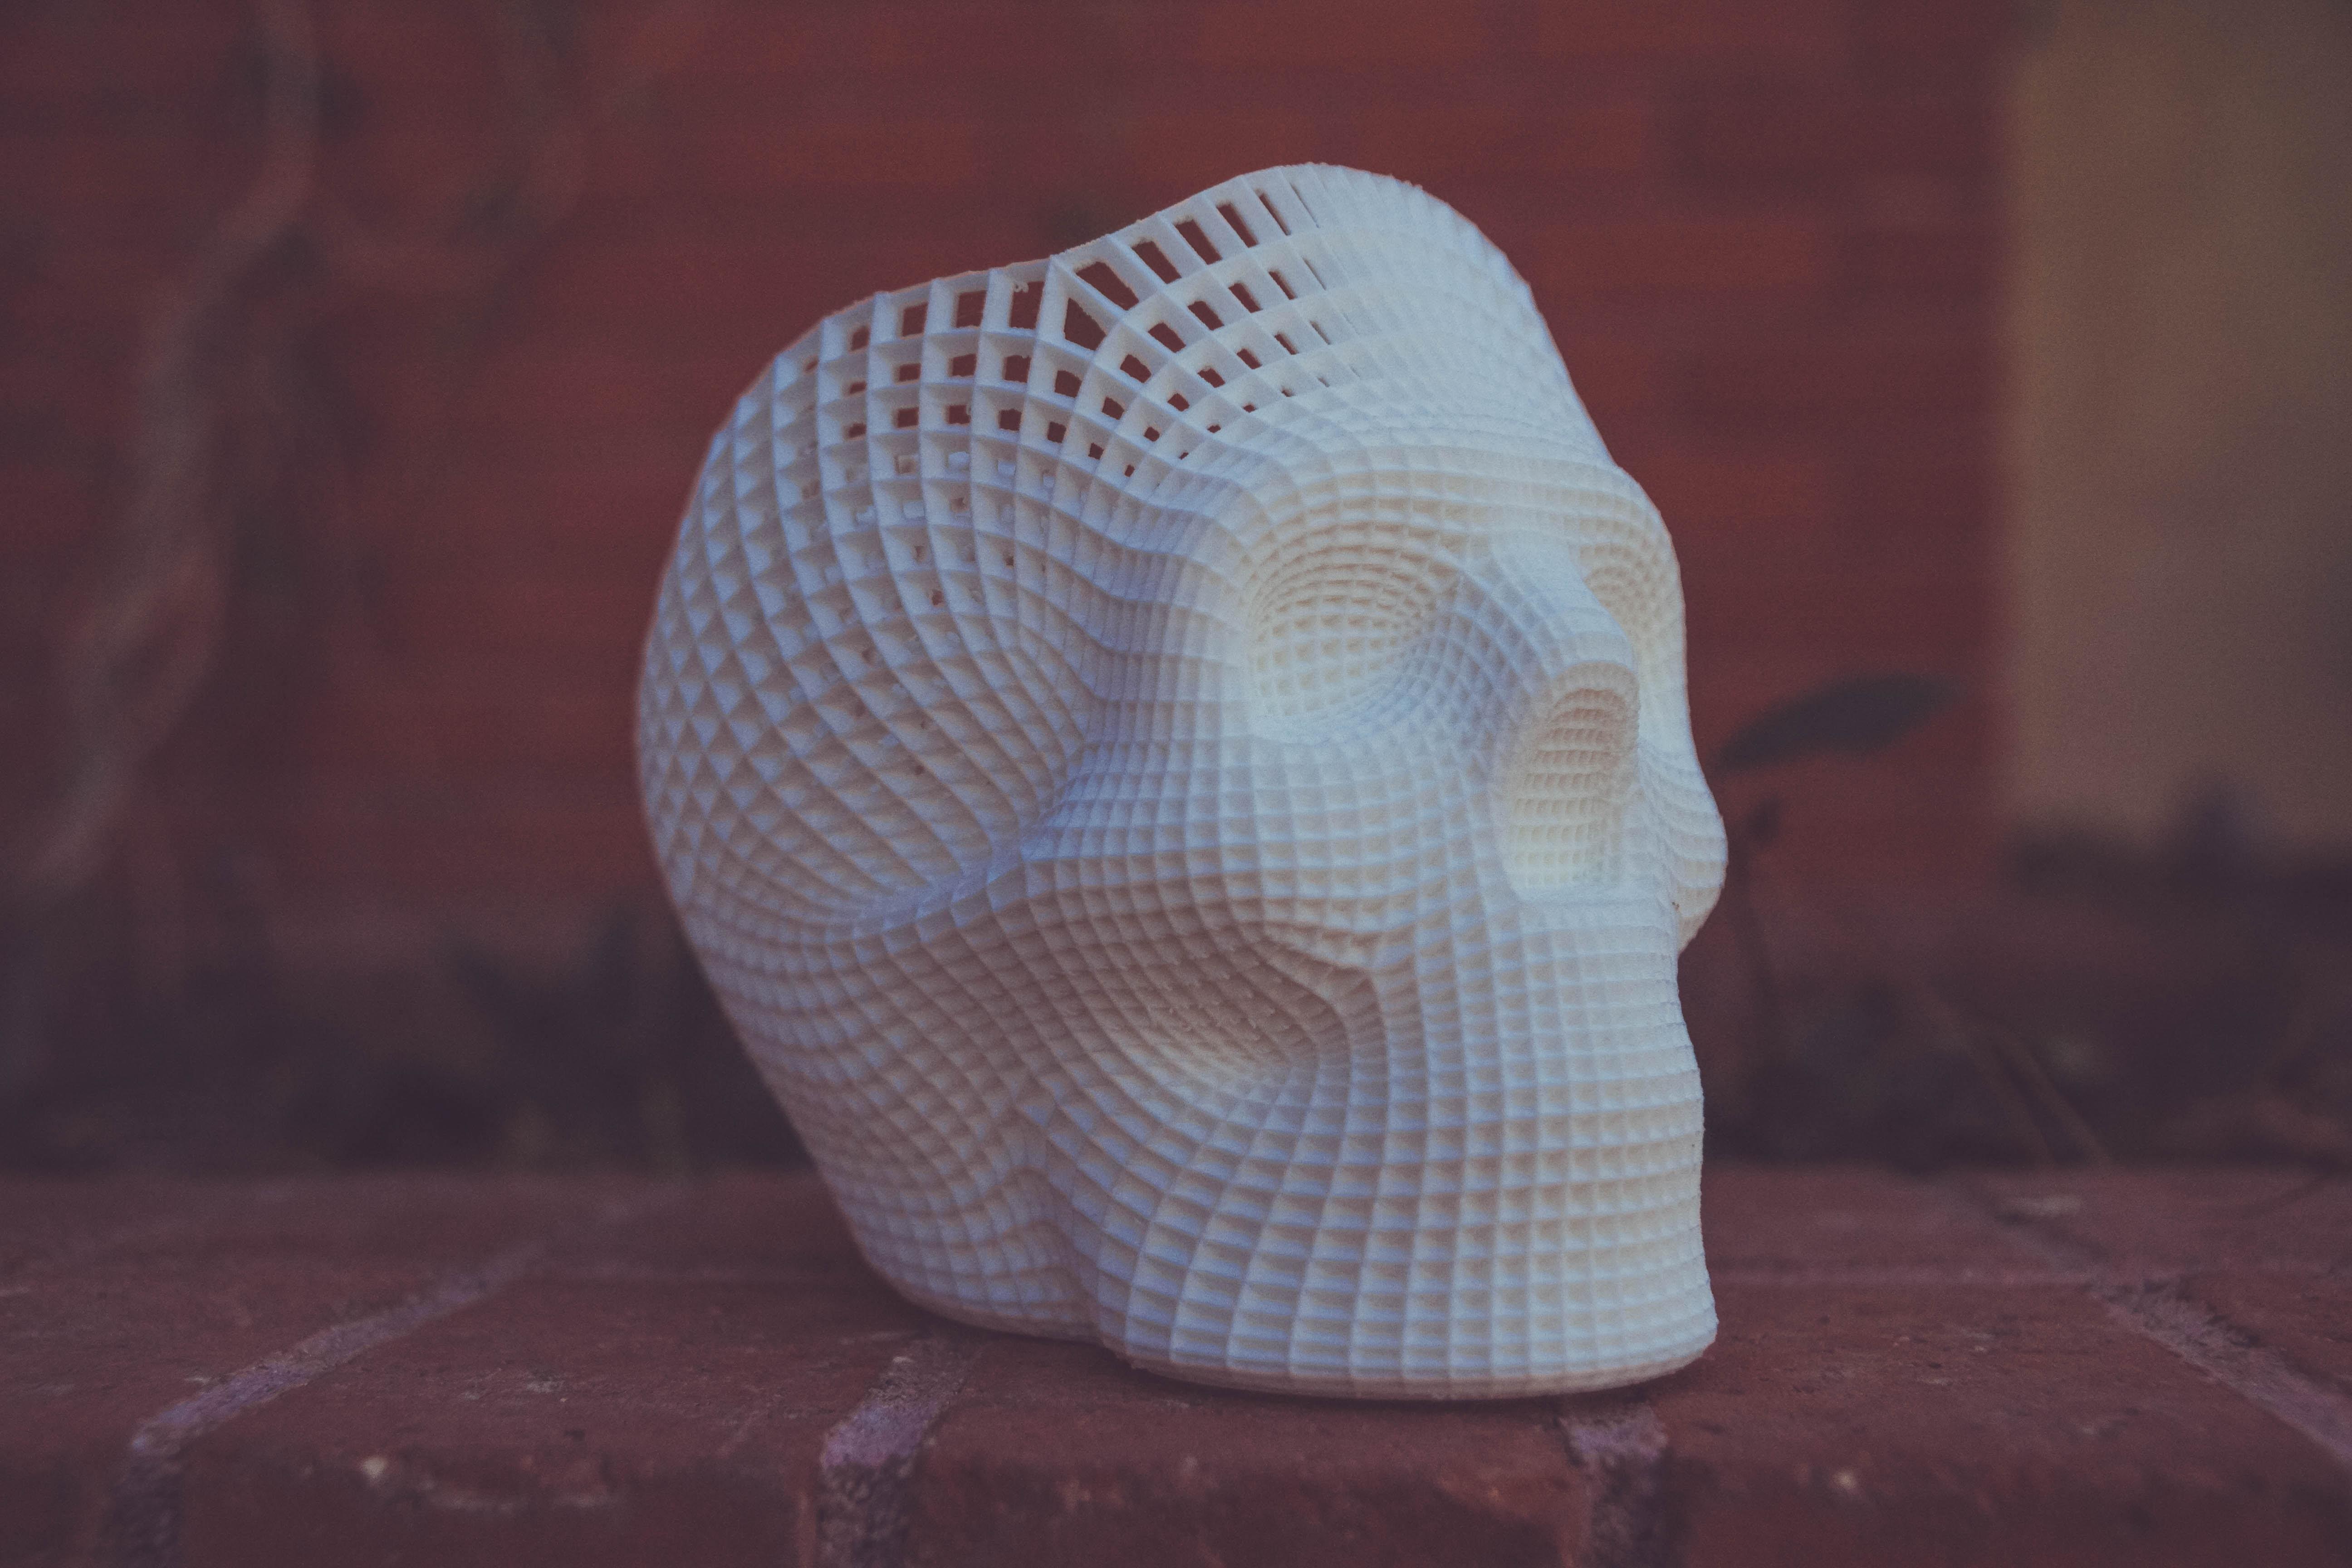 Fremtiden er her med 3D printer